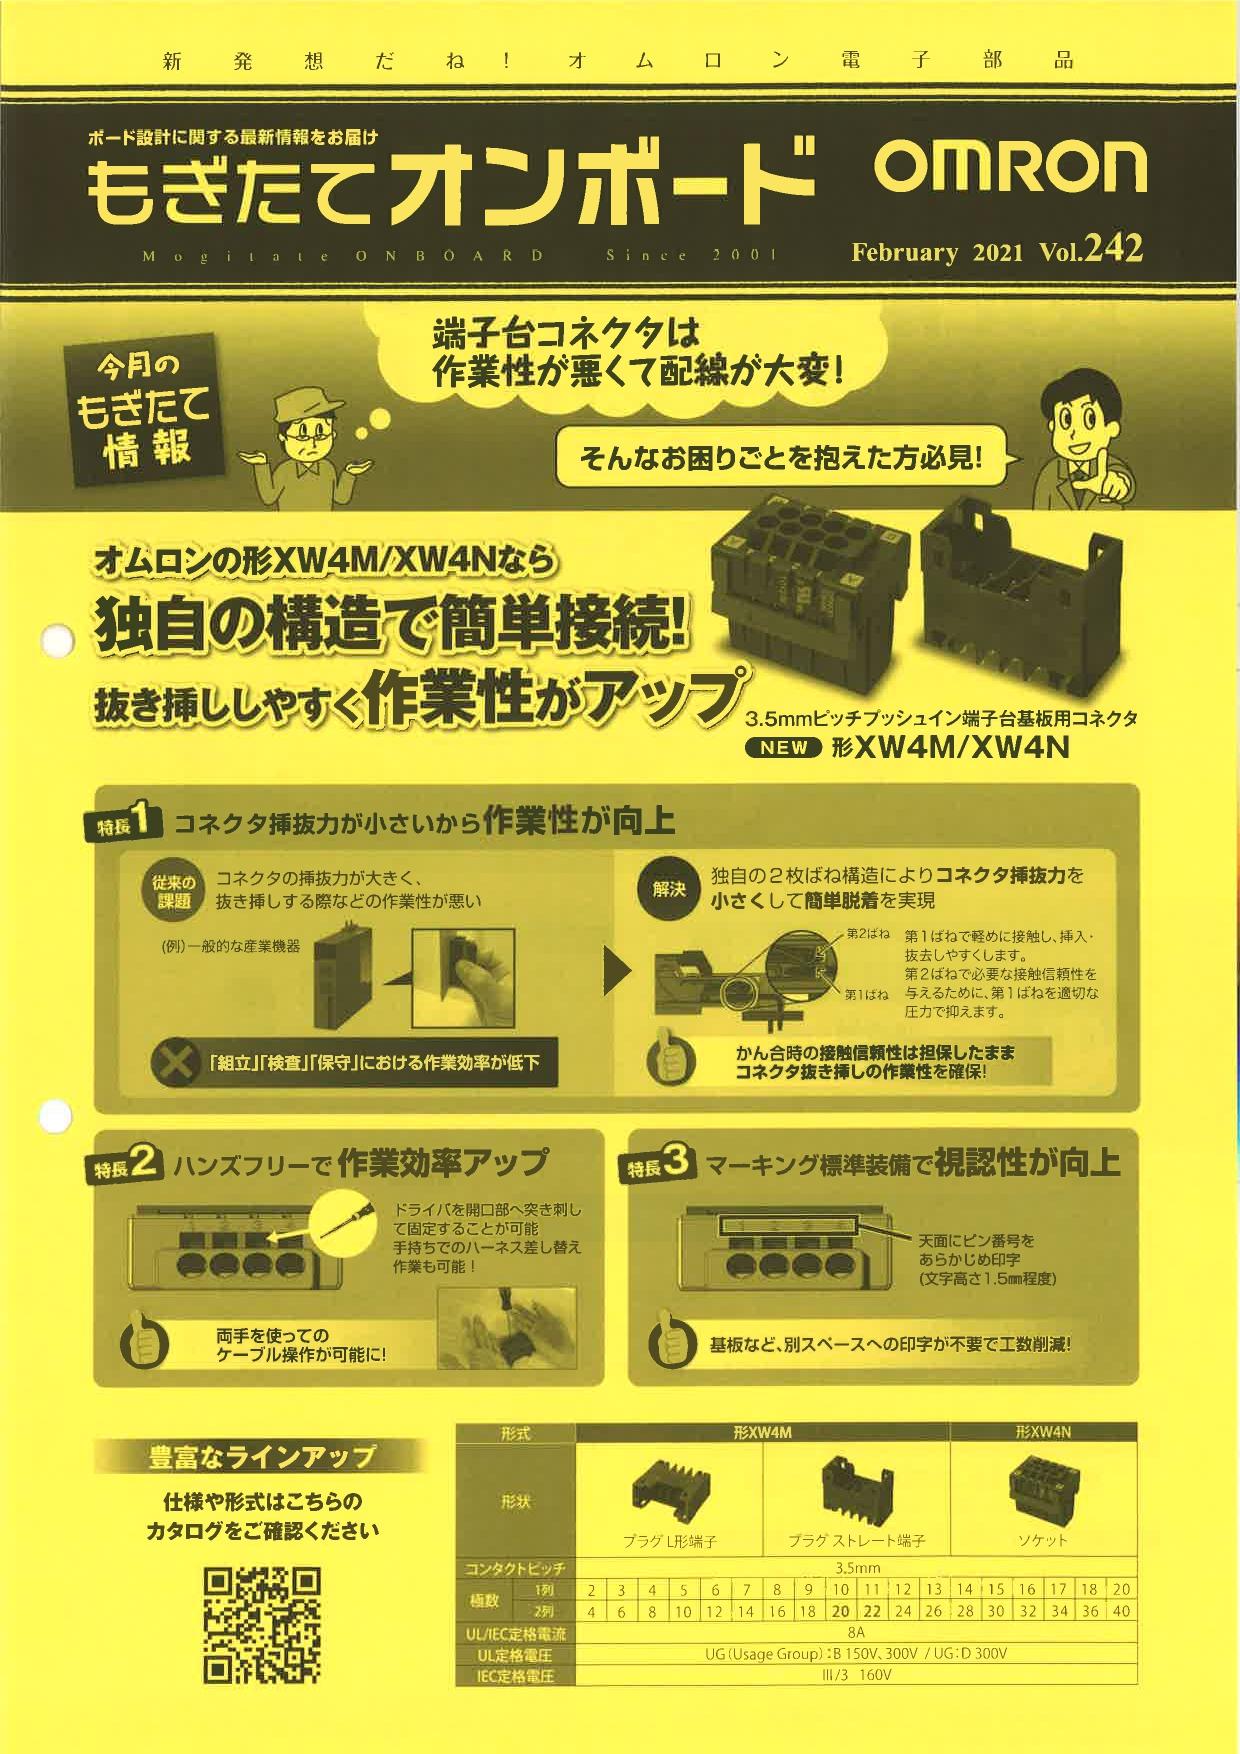 http://epace.co.jp/swfu/d/MogitateOnboard_Vol.242_01.jpg